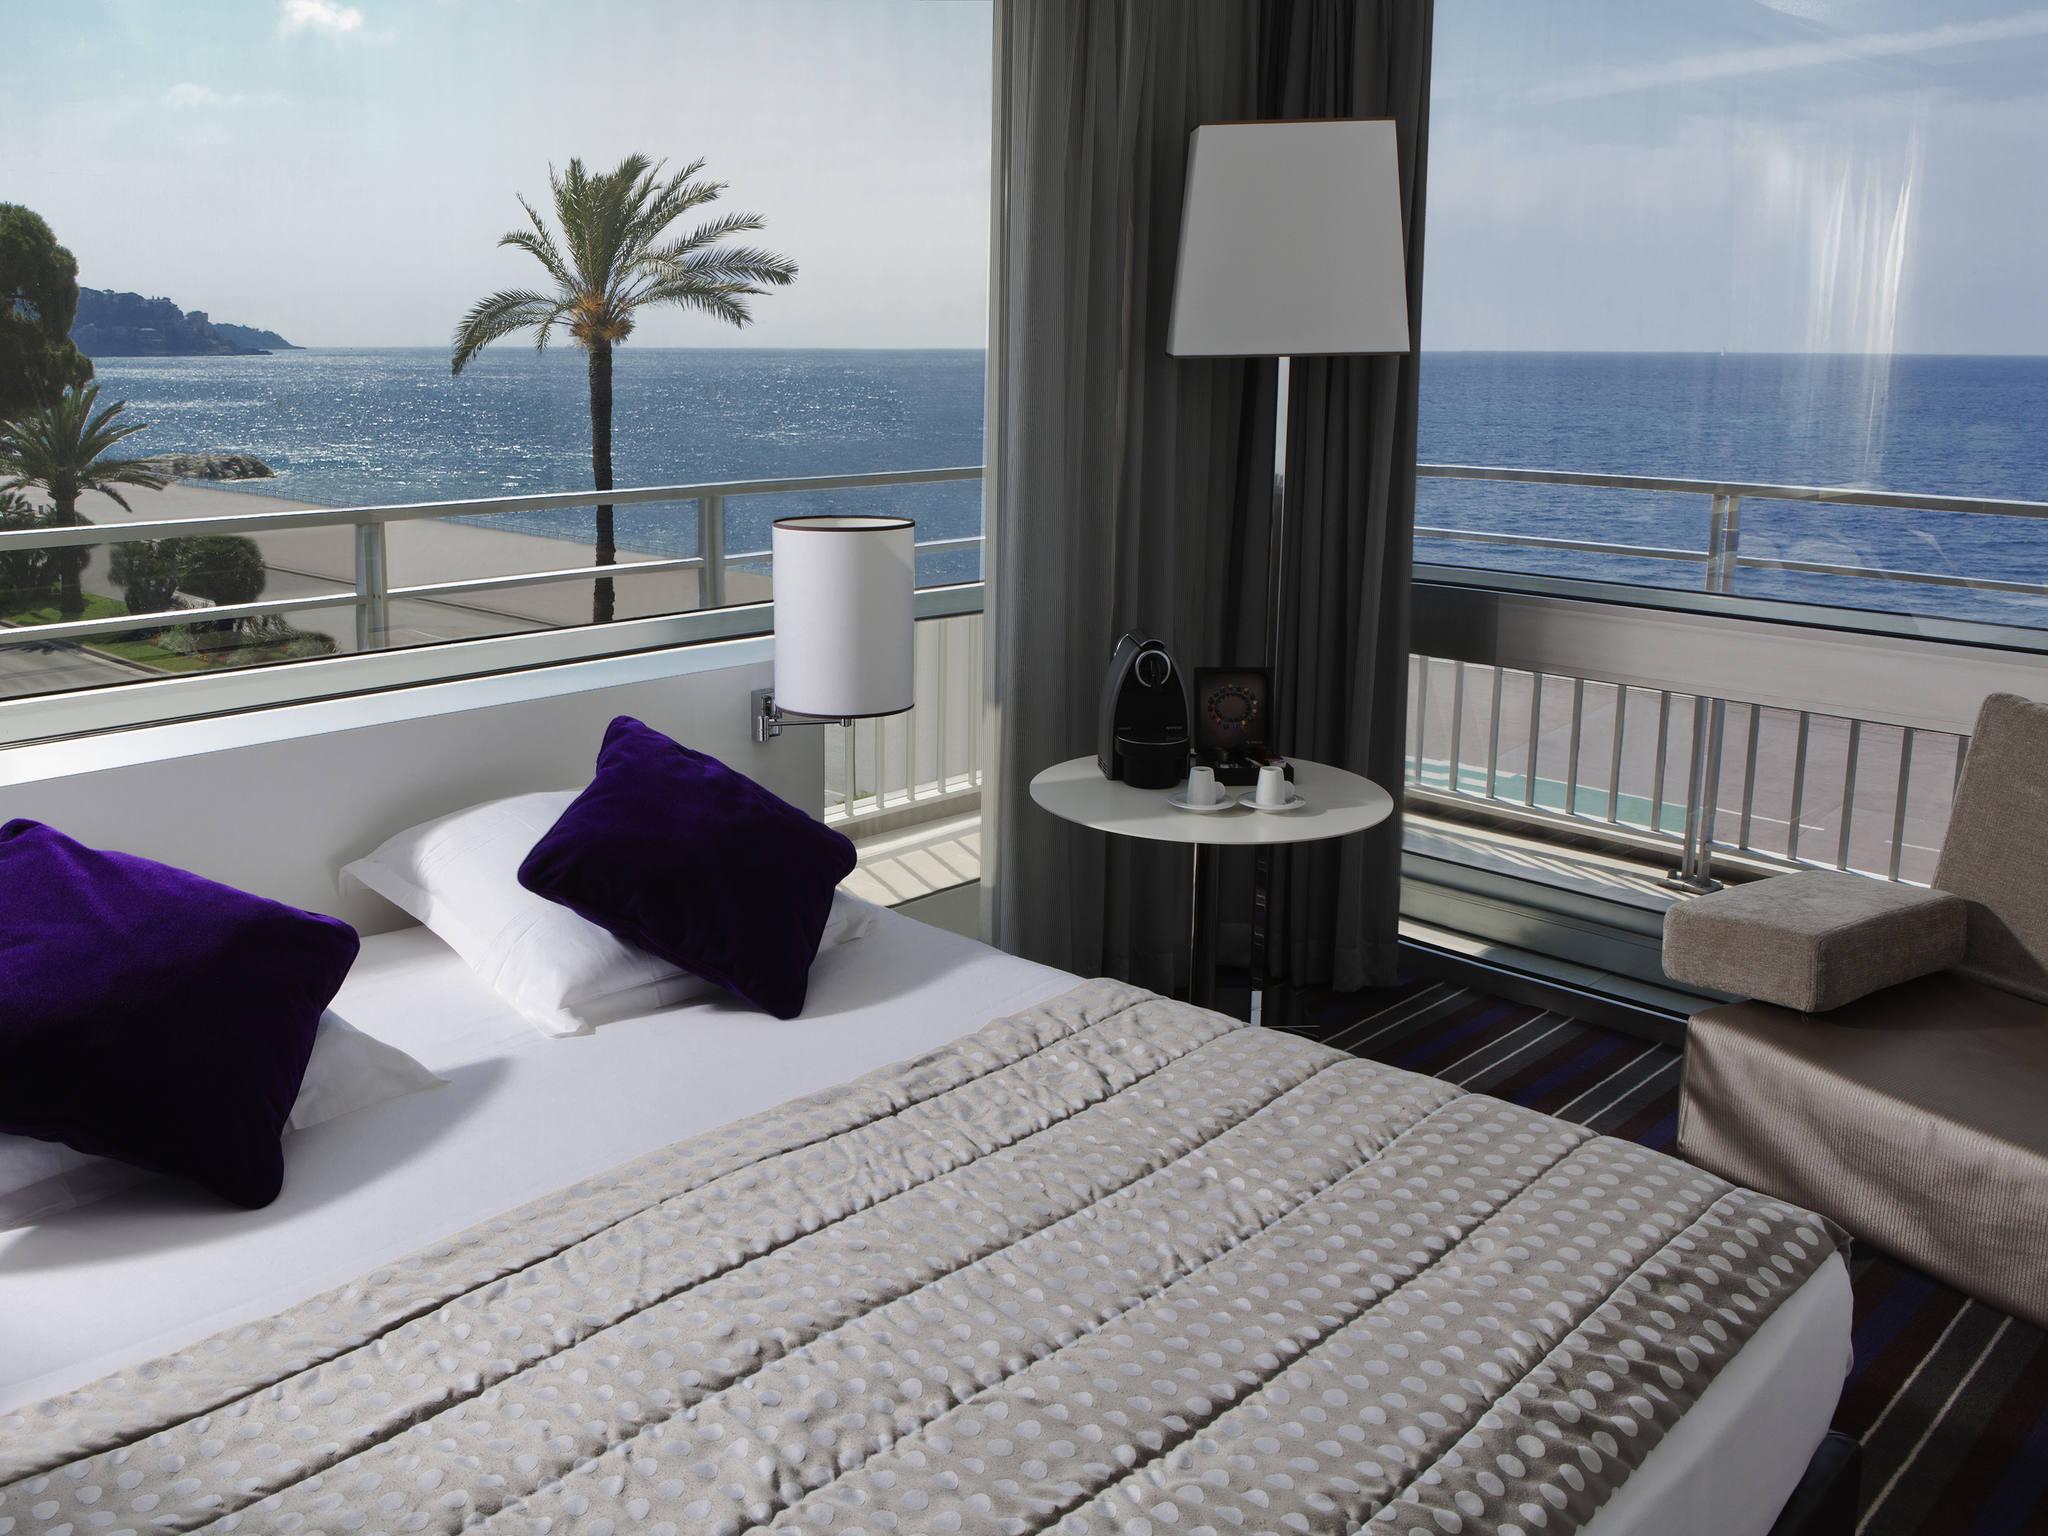 Hotel - Mercure Nice Promenade des Anglais Hotel